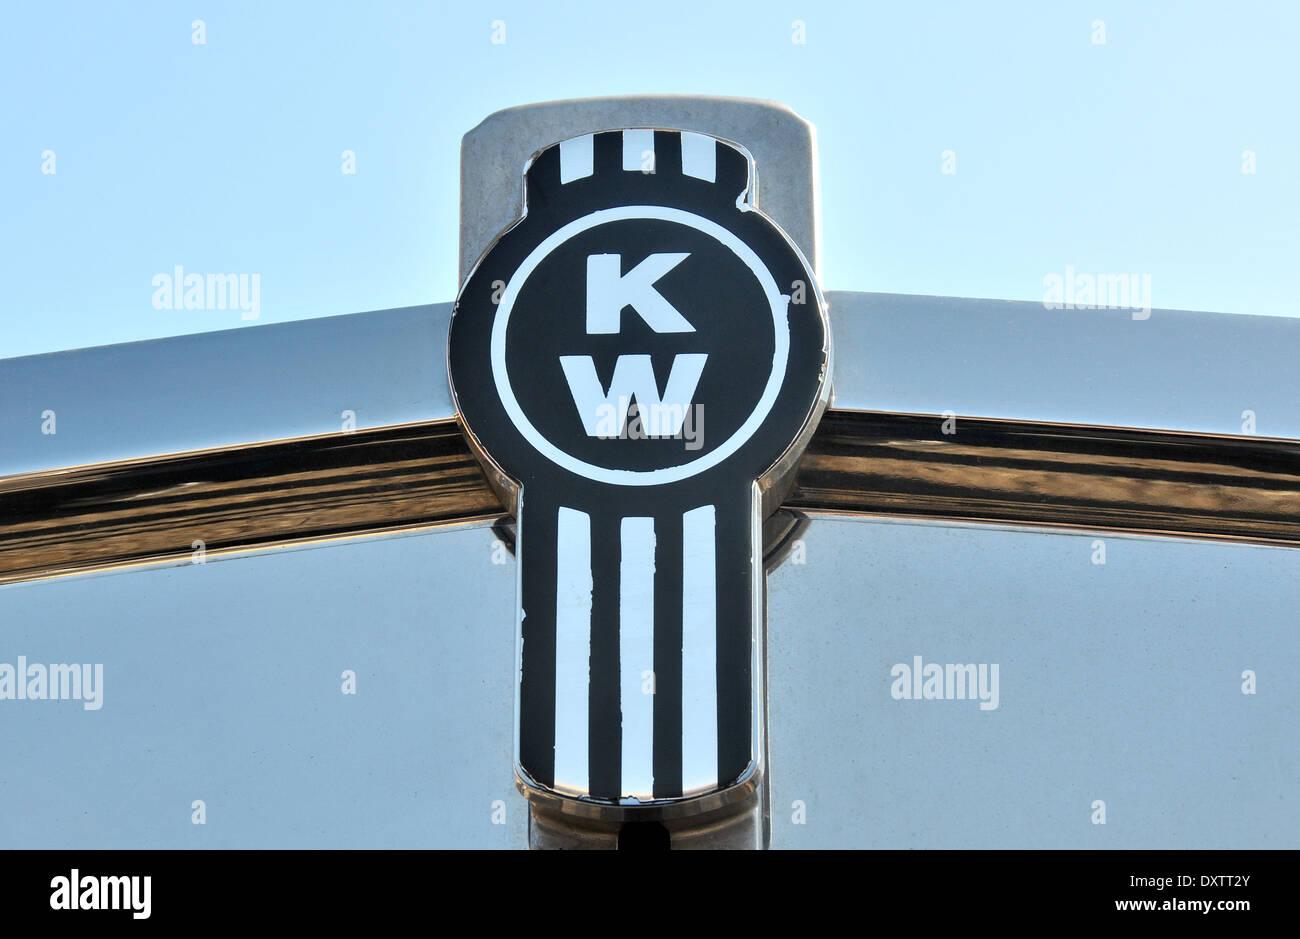 Kenworth truck logo - Stock Image